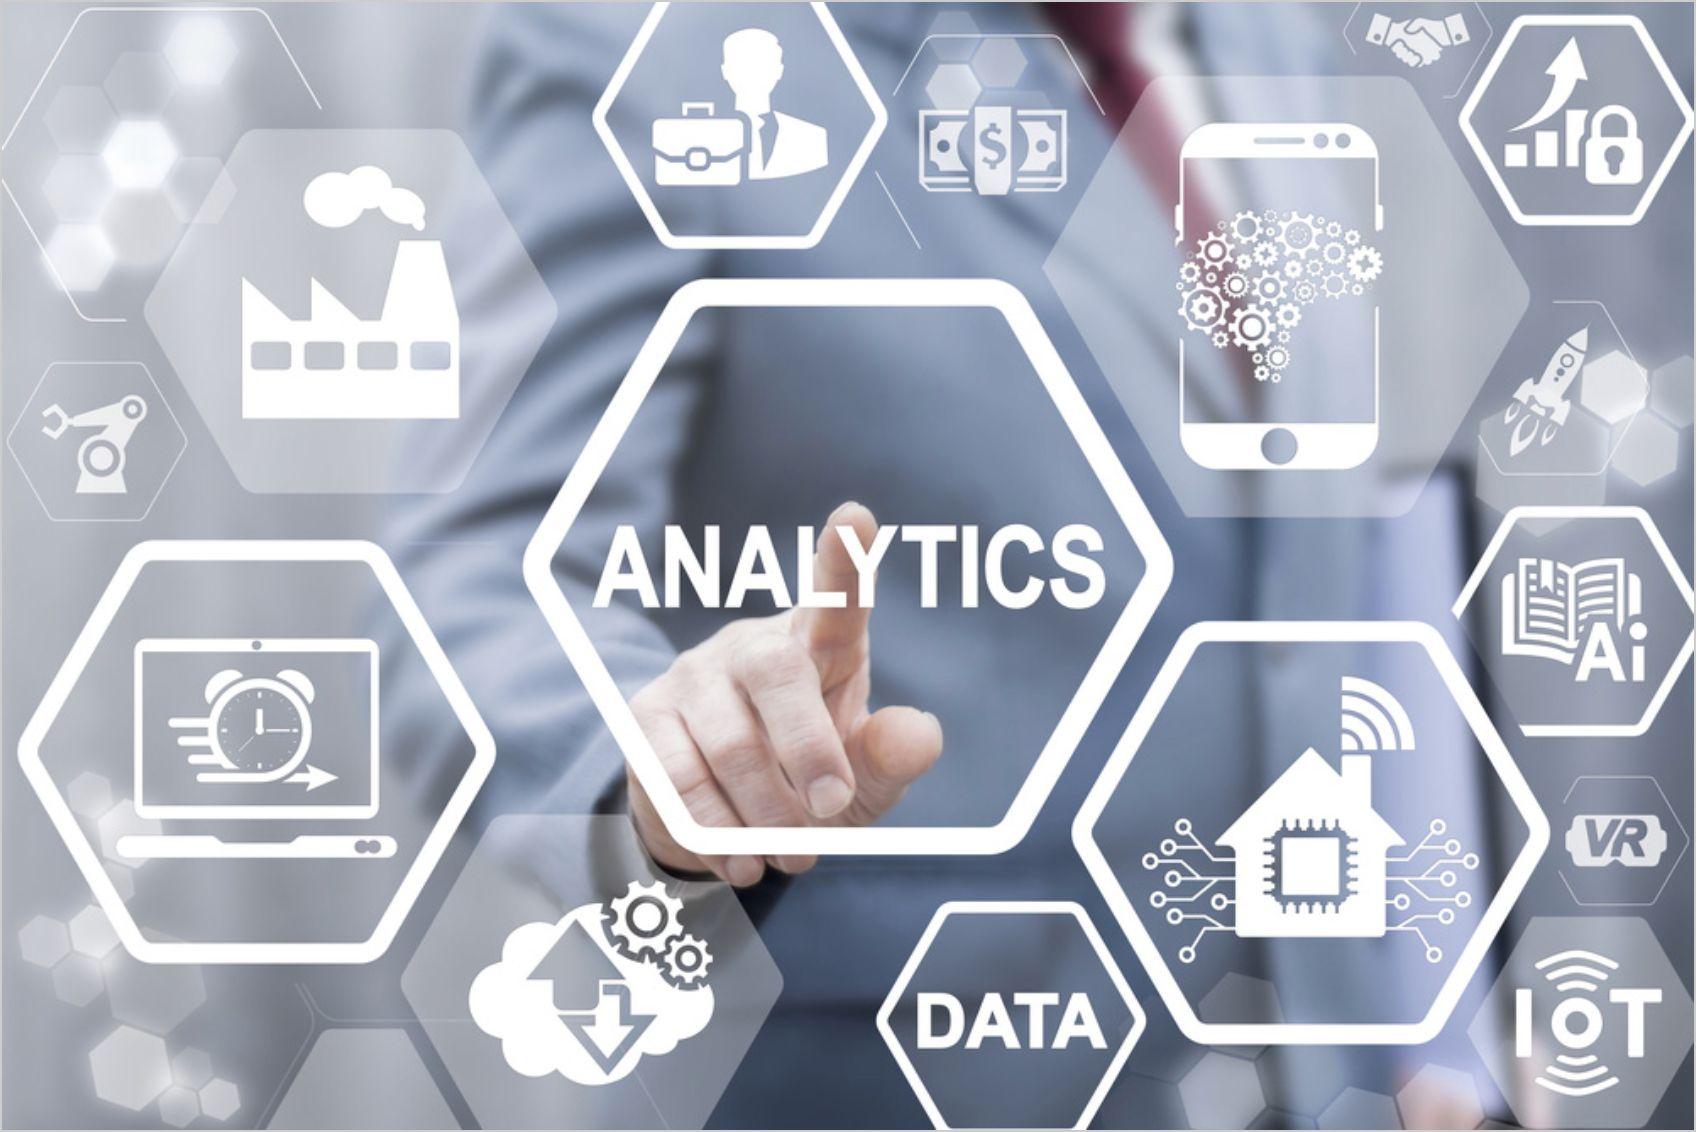 /augmented-analytics-and-data-storytelling-covid-ups-fpanda-demand-w9293tin feature image